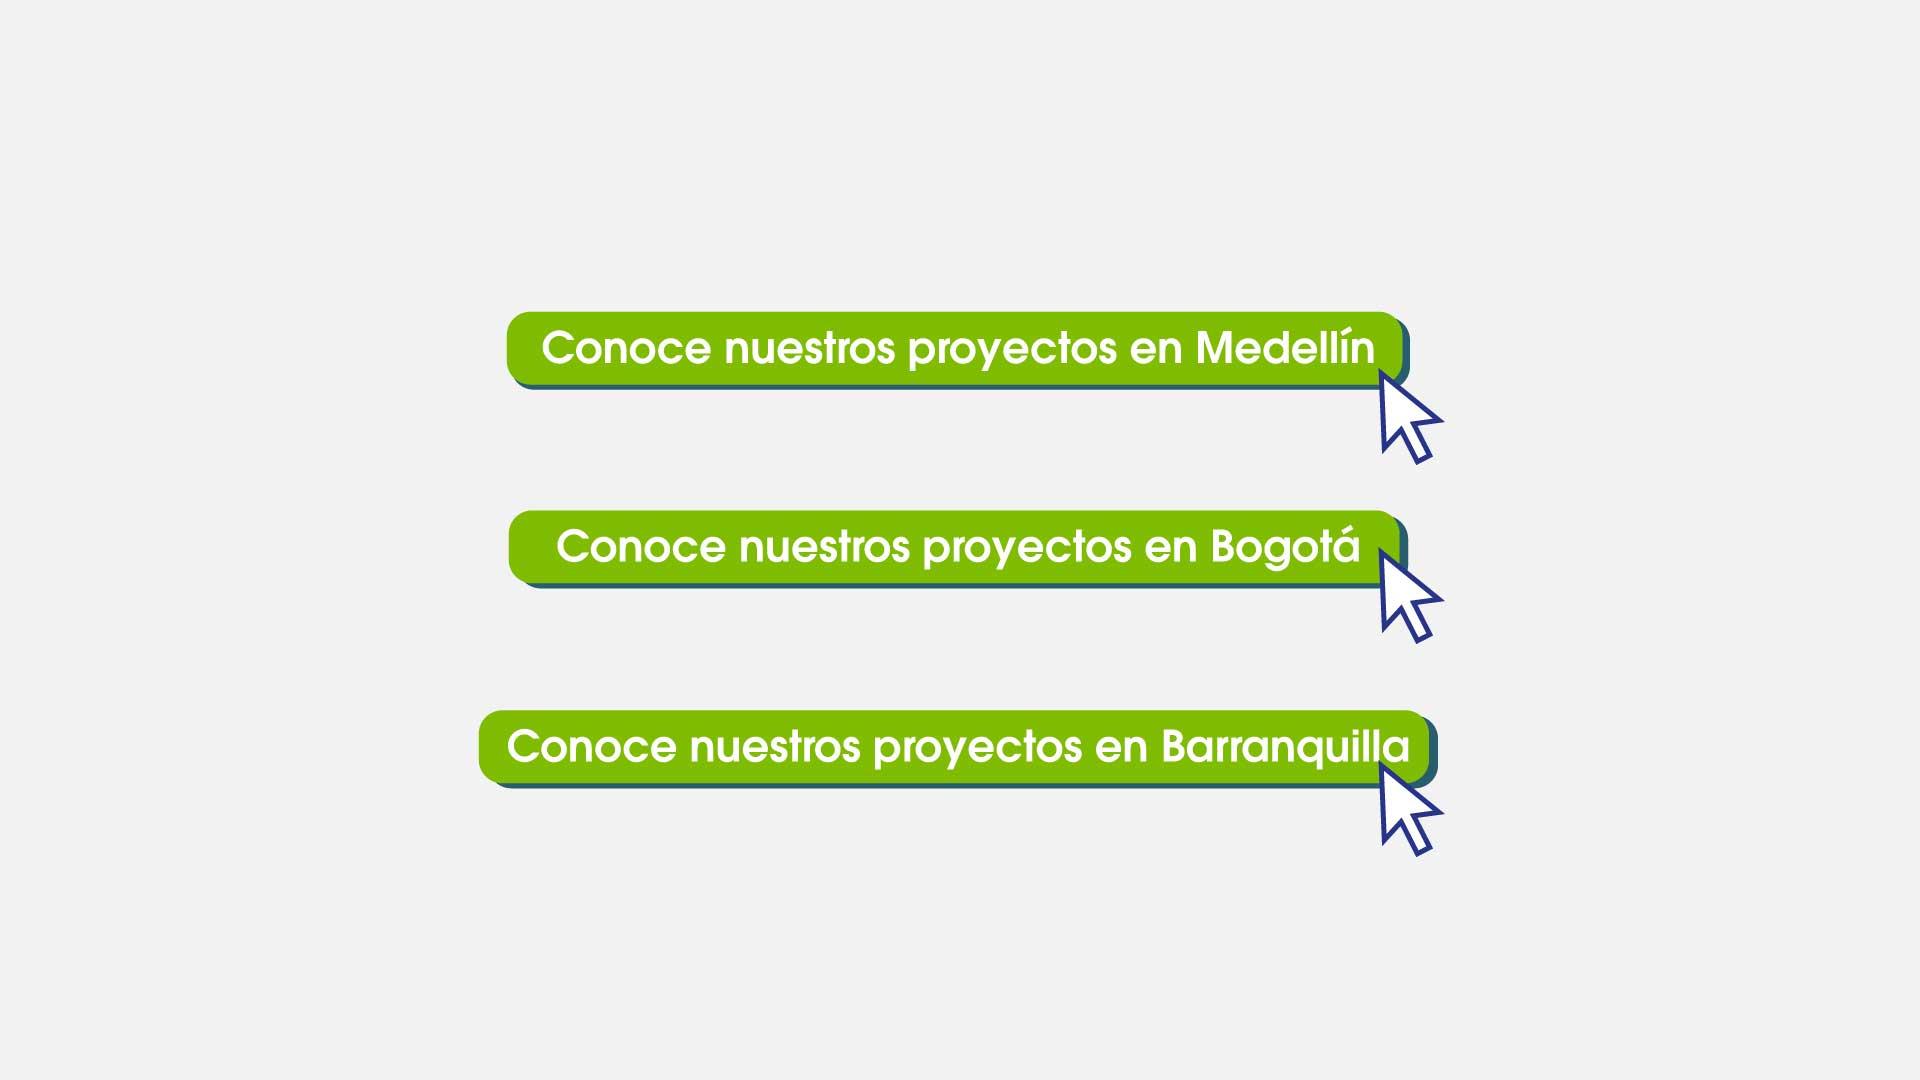 Langing_1_conaltura